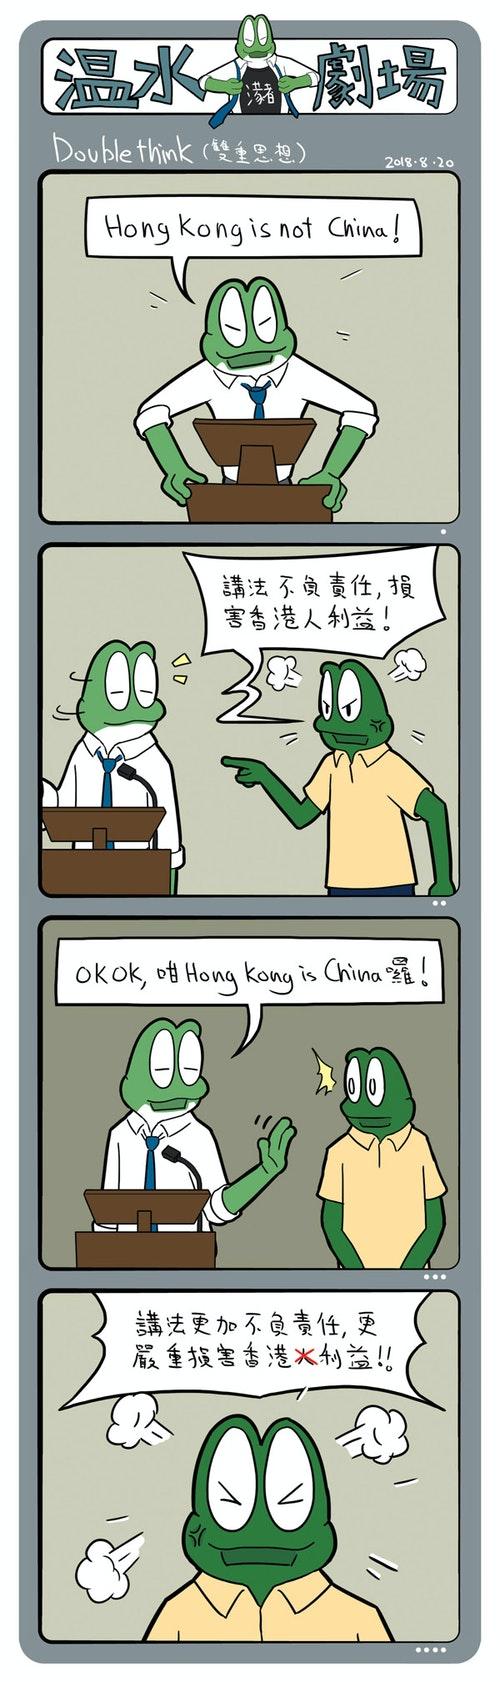 frog_news_lens_165_566